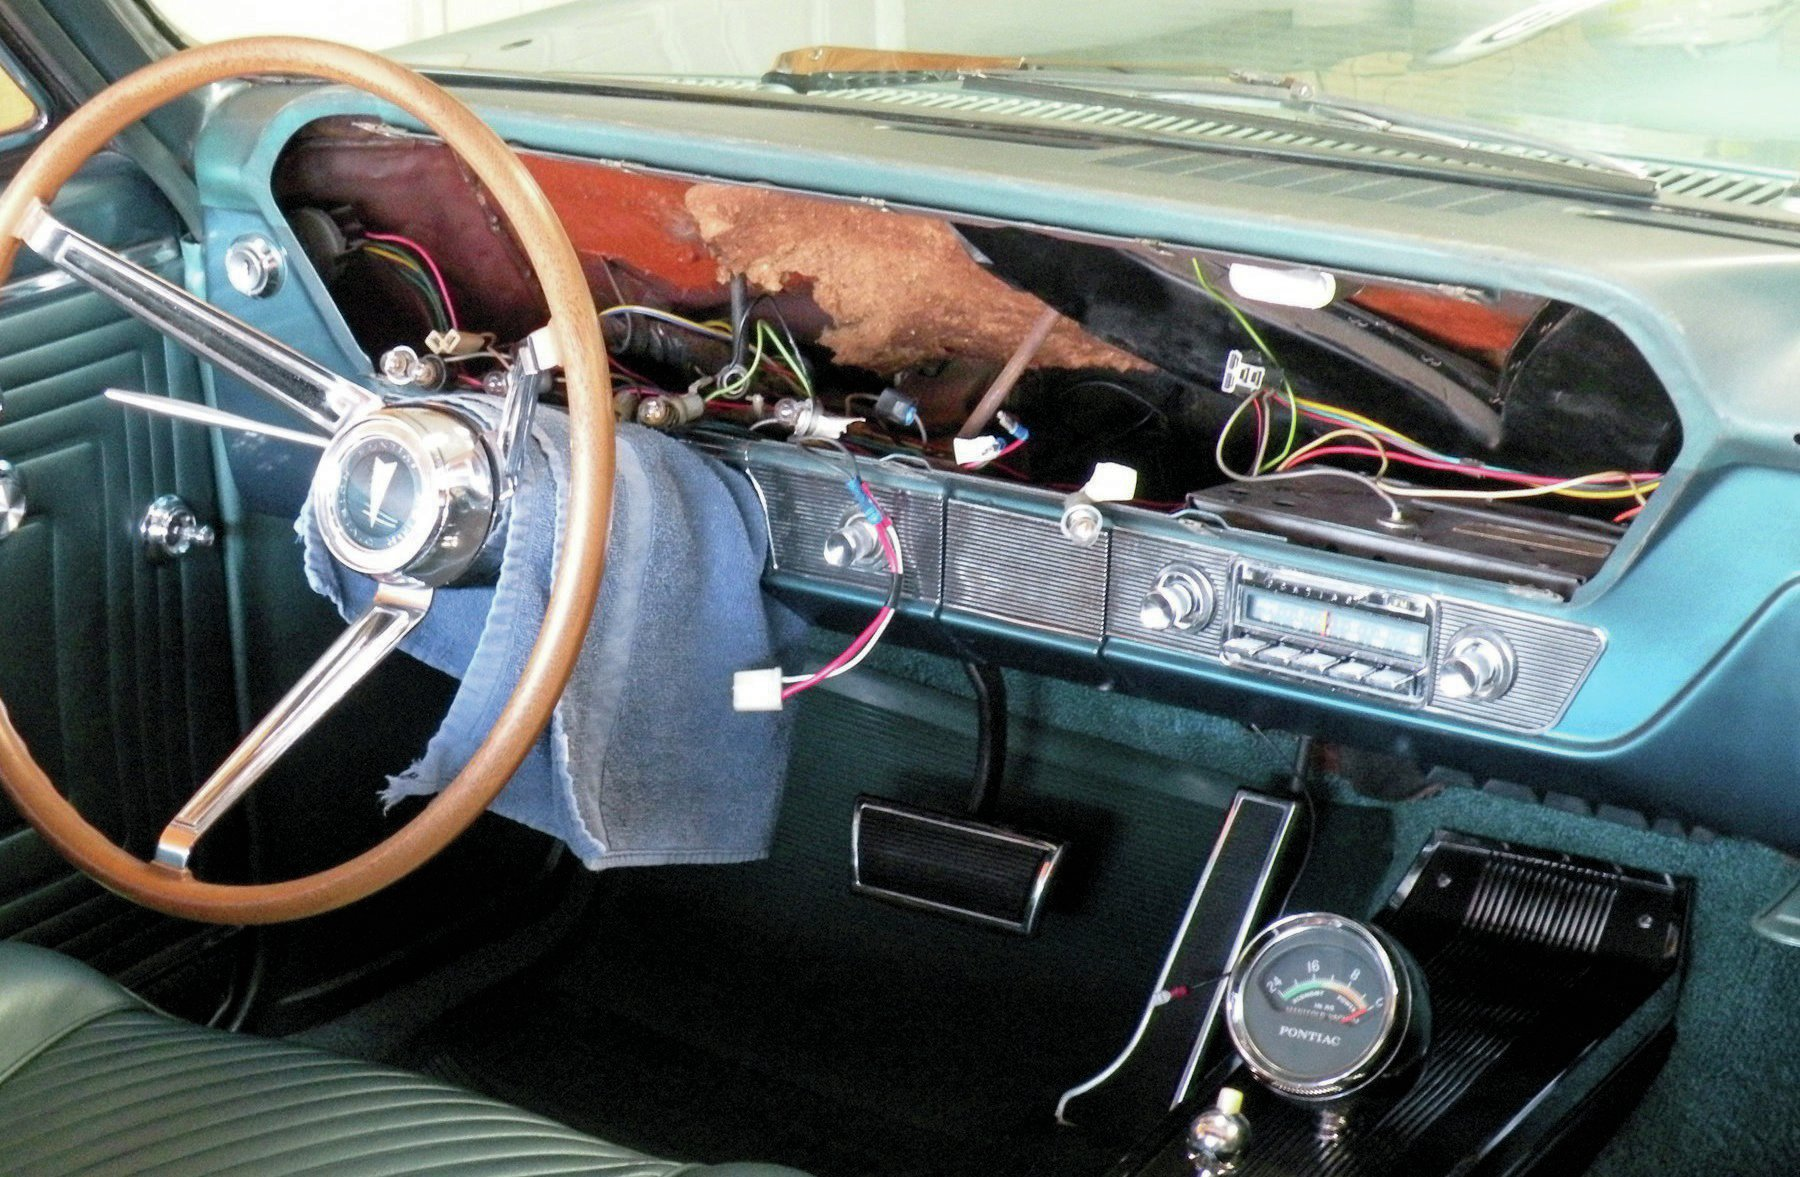 medium resolution of 1967 gto rally gauge wiring diagram wiring library 1965 gto dash wiring diagram